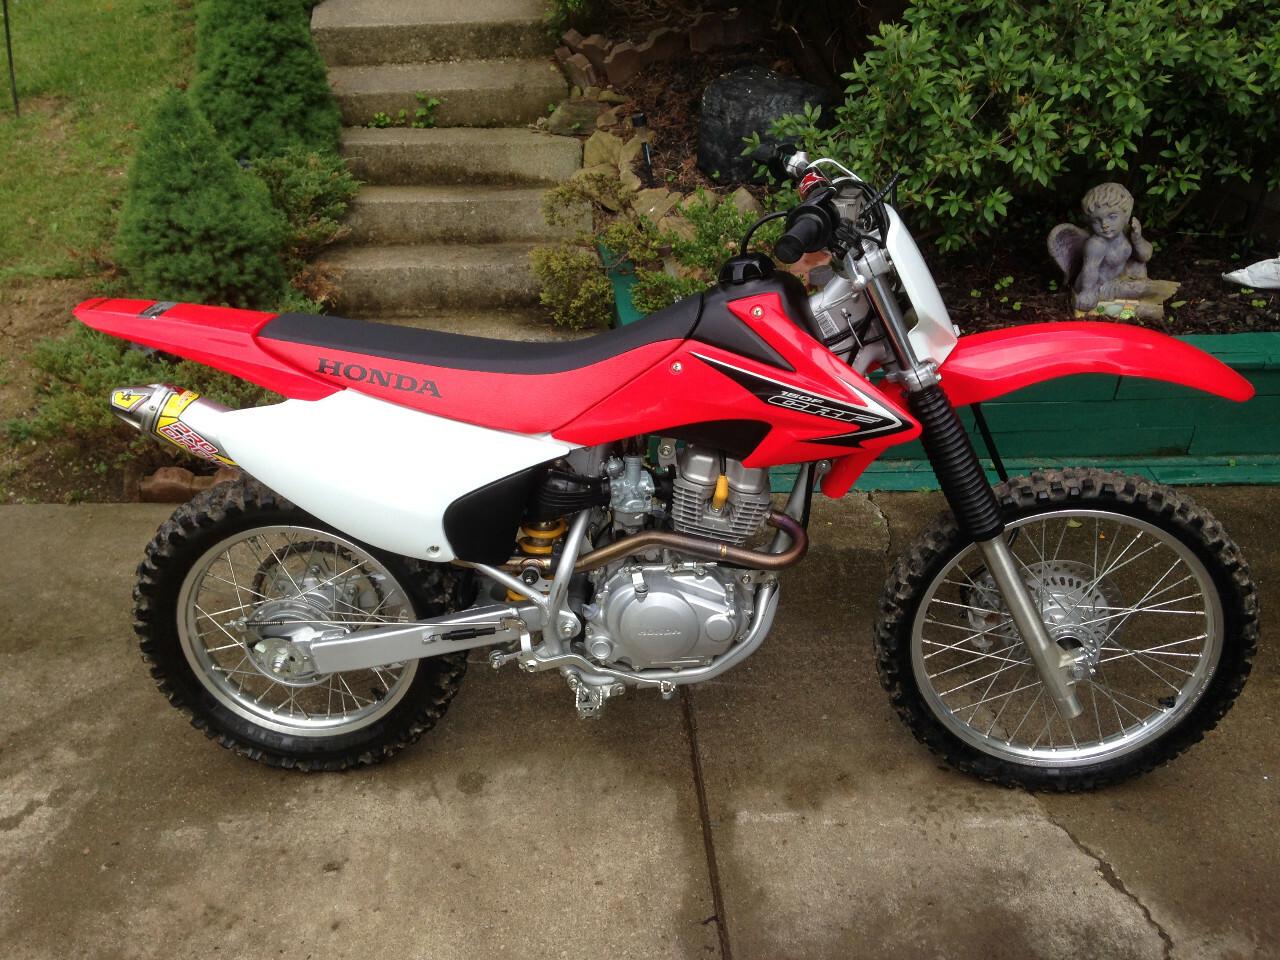 Honda motorcycle dealers in lexington ky lexington honda for Yamaha lexington ky